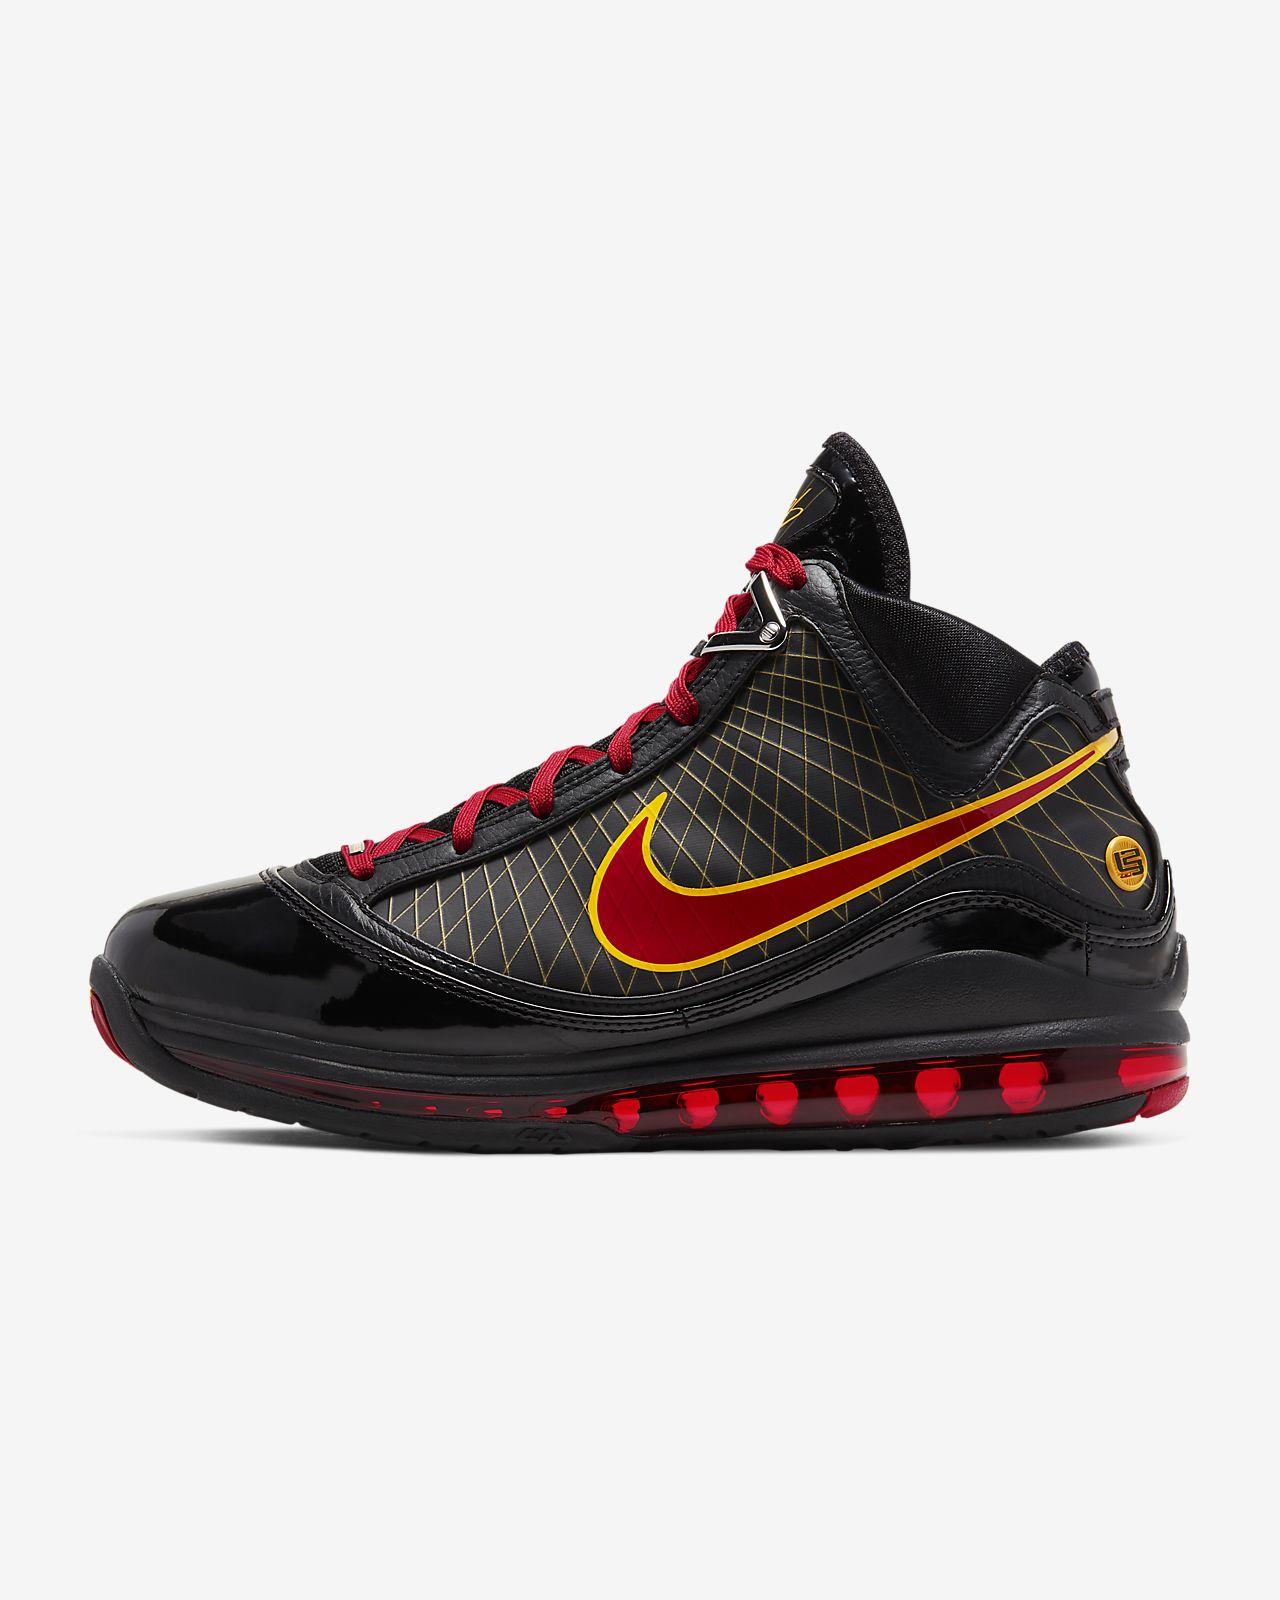 Nike LeBron VII QS 男子运动鞋